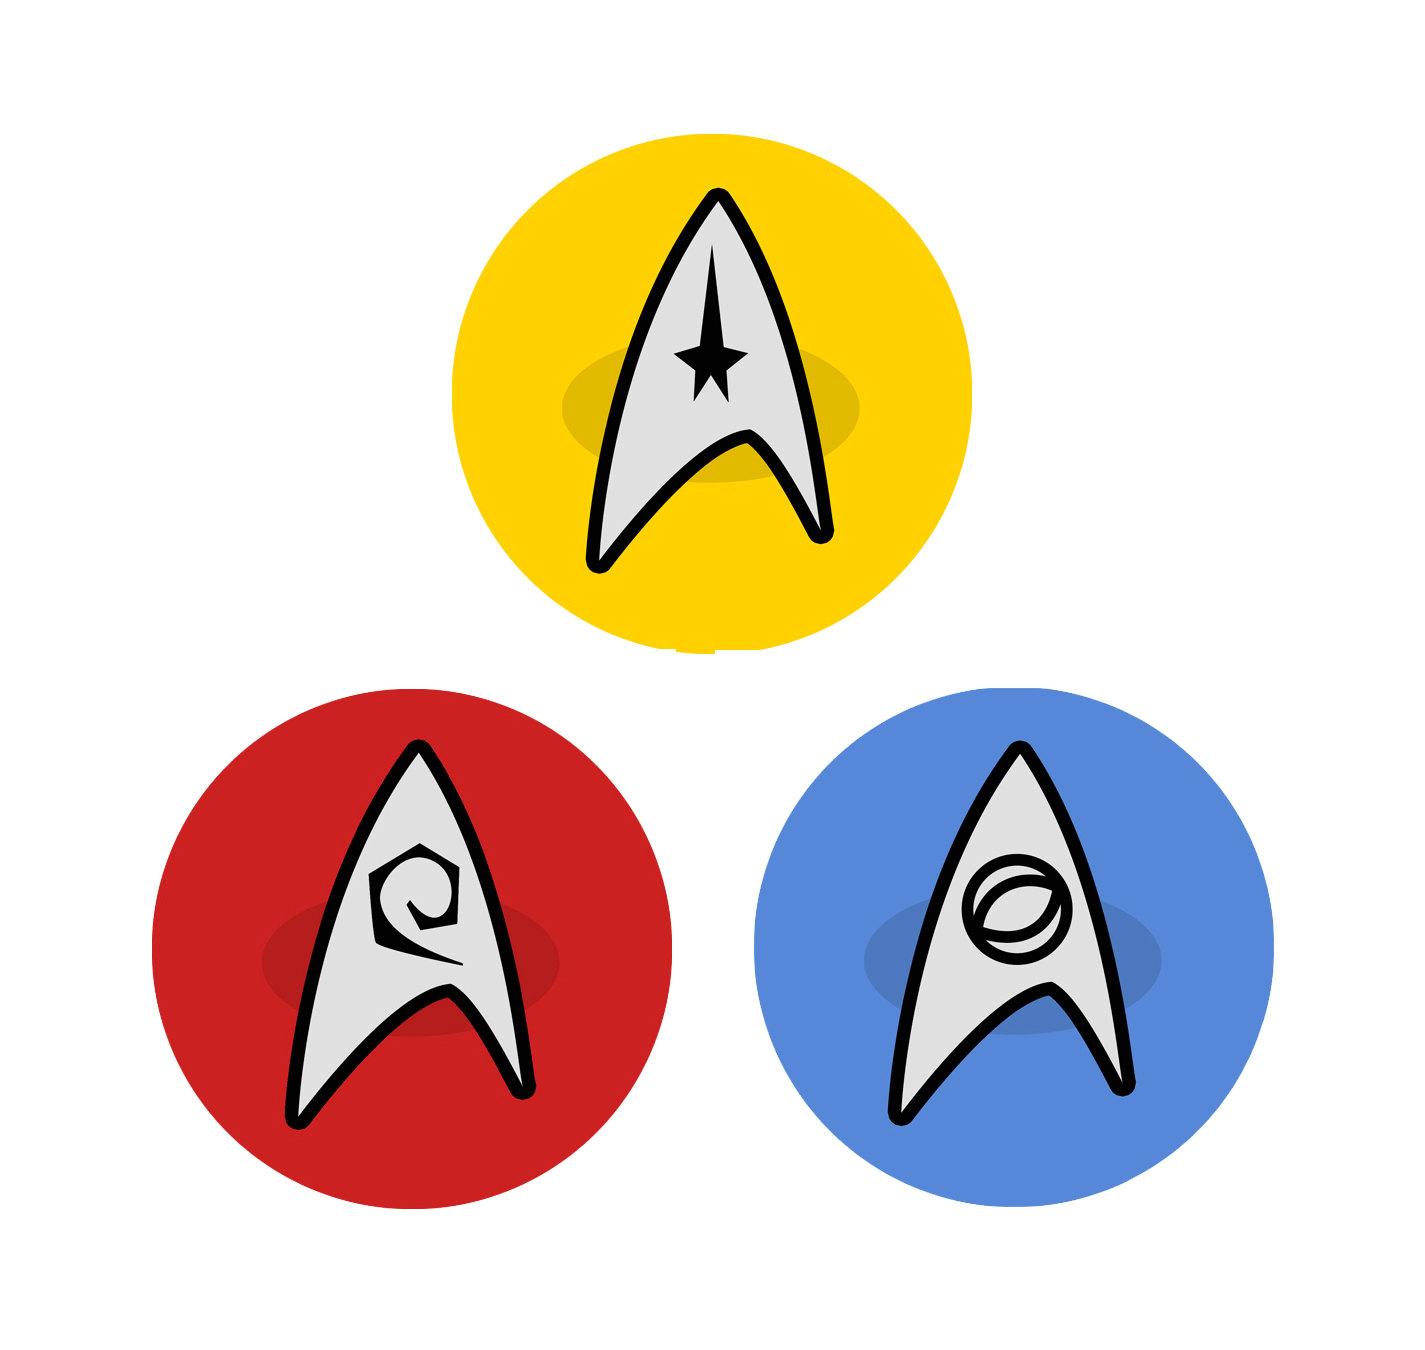 badge templates free download